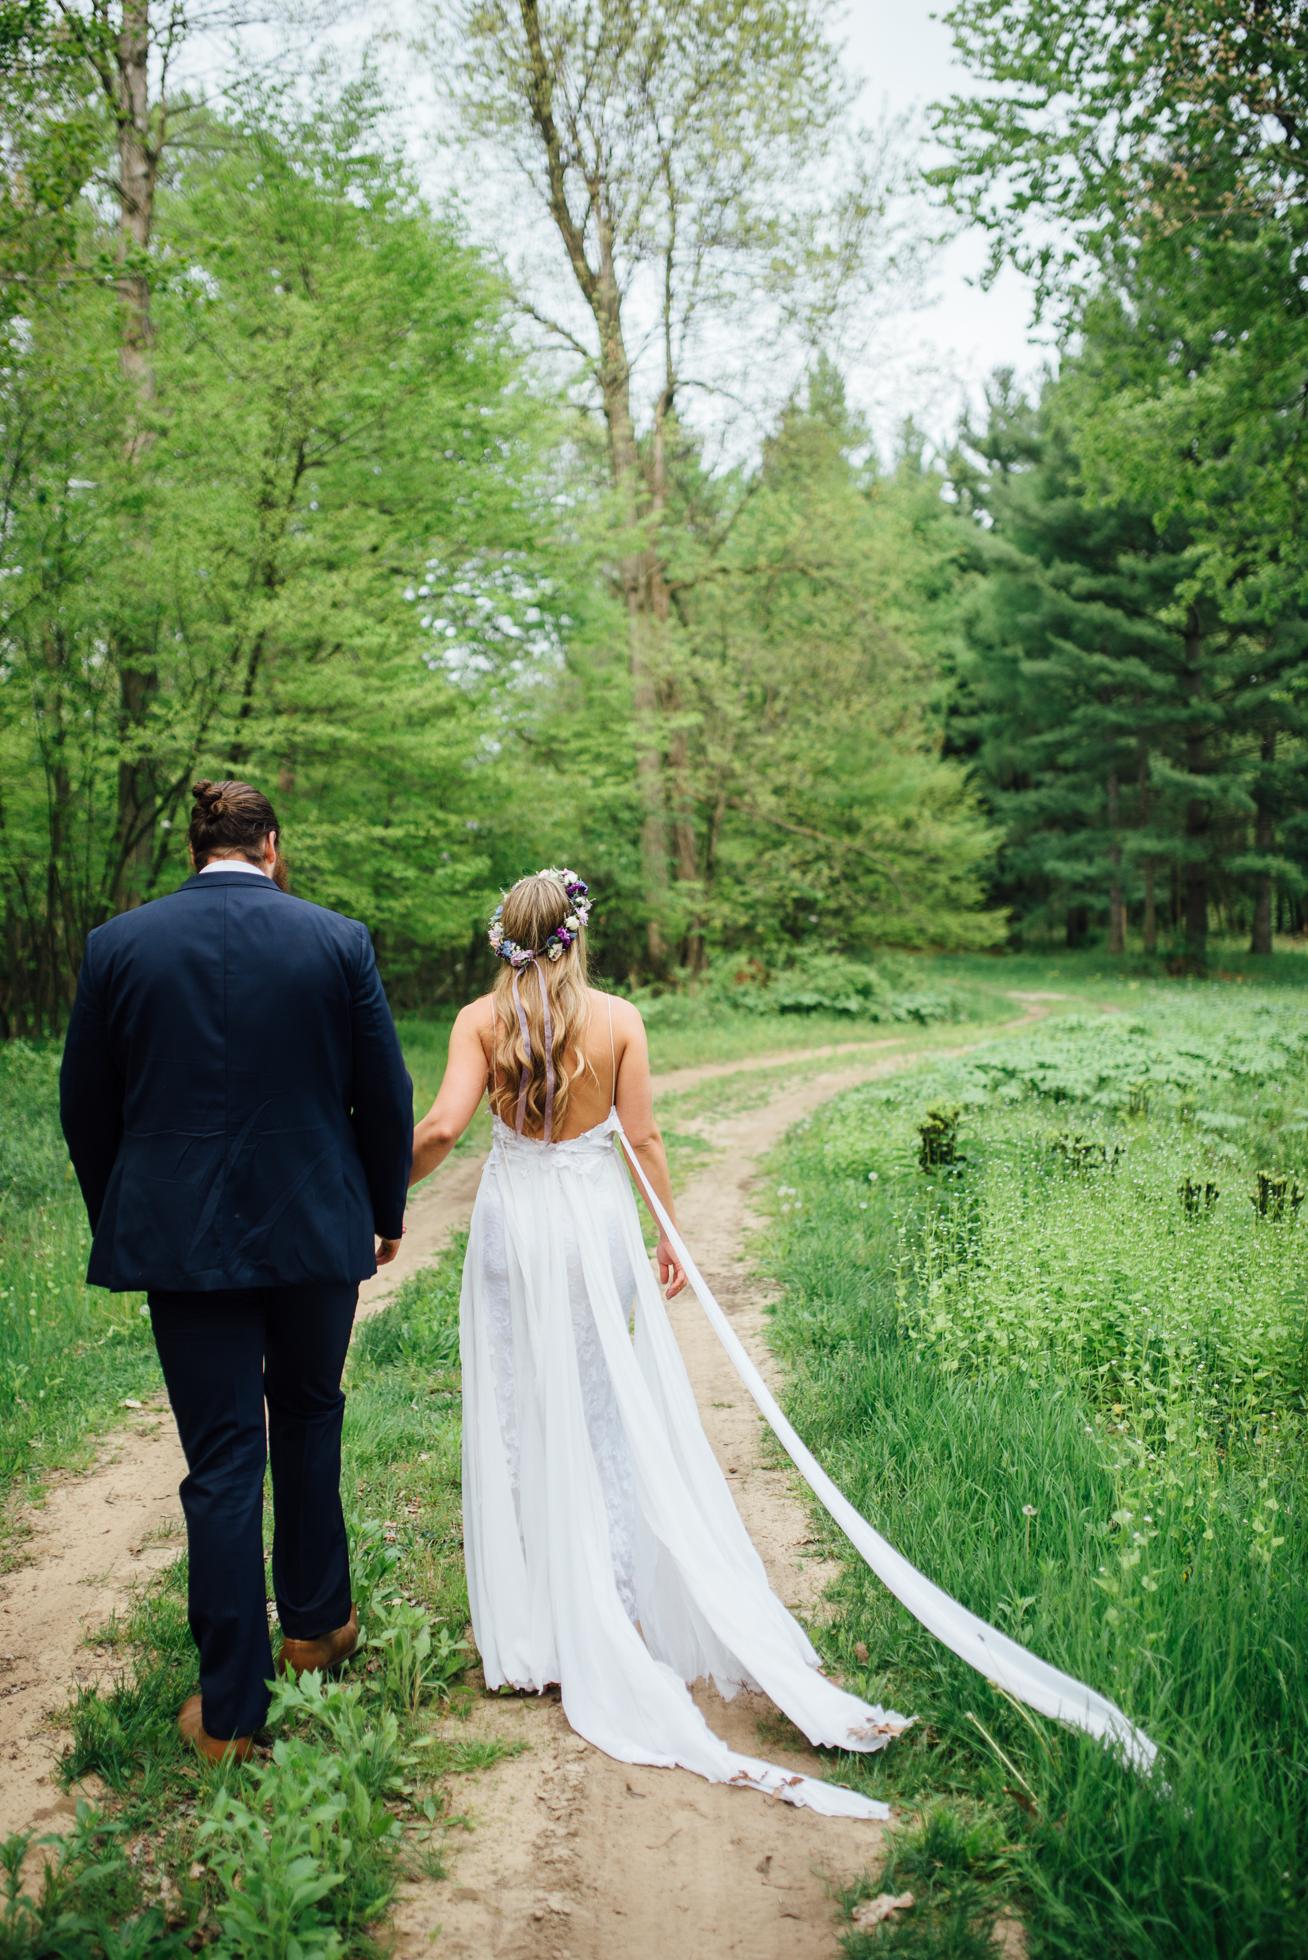 Outdoor wedding at Fernwood Hills in London, Ontario photographed by Sara Monika, Photographer.